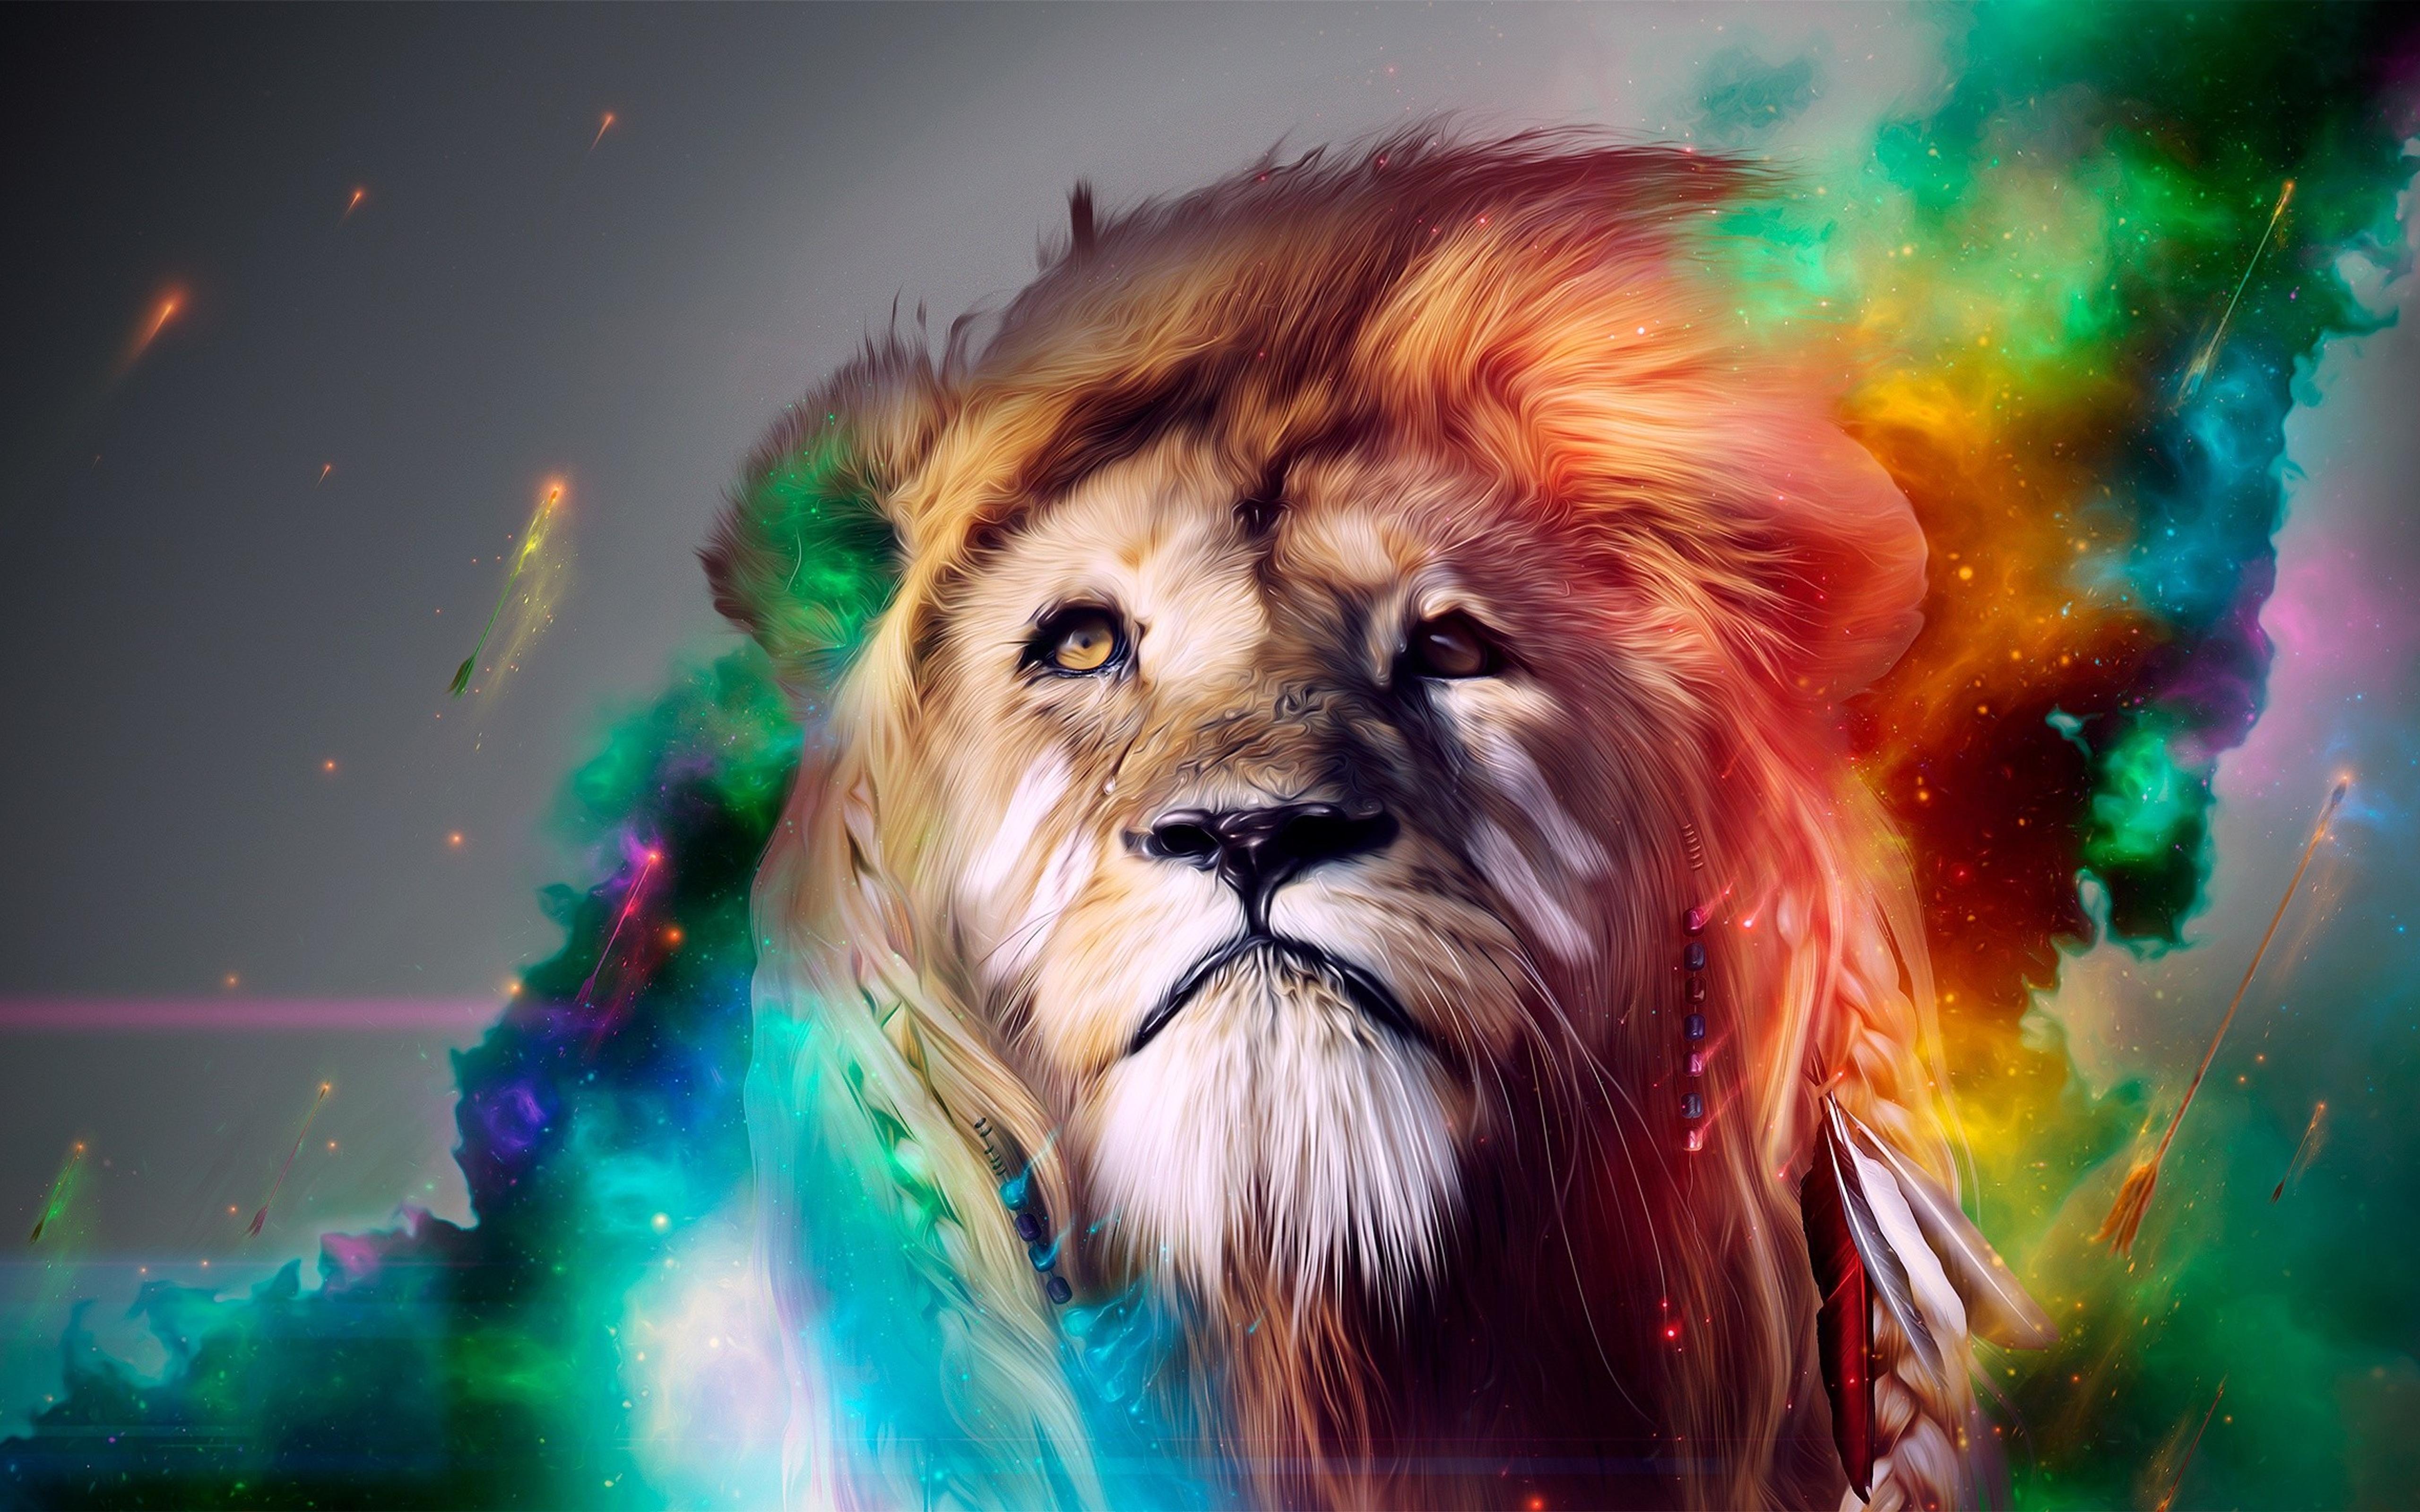 Download Wallpaper 5120x3200 Digital Art Design